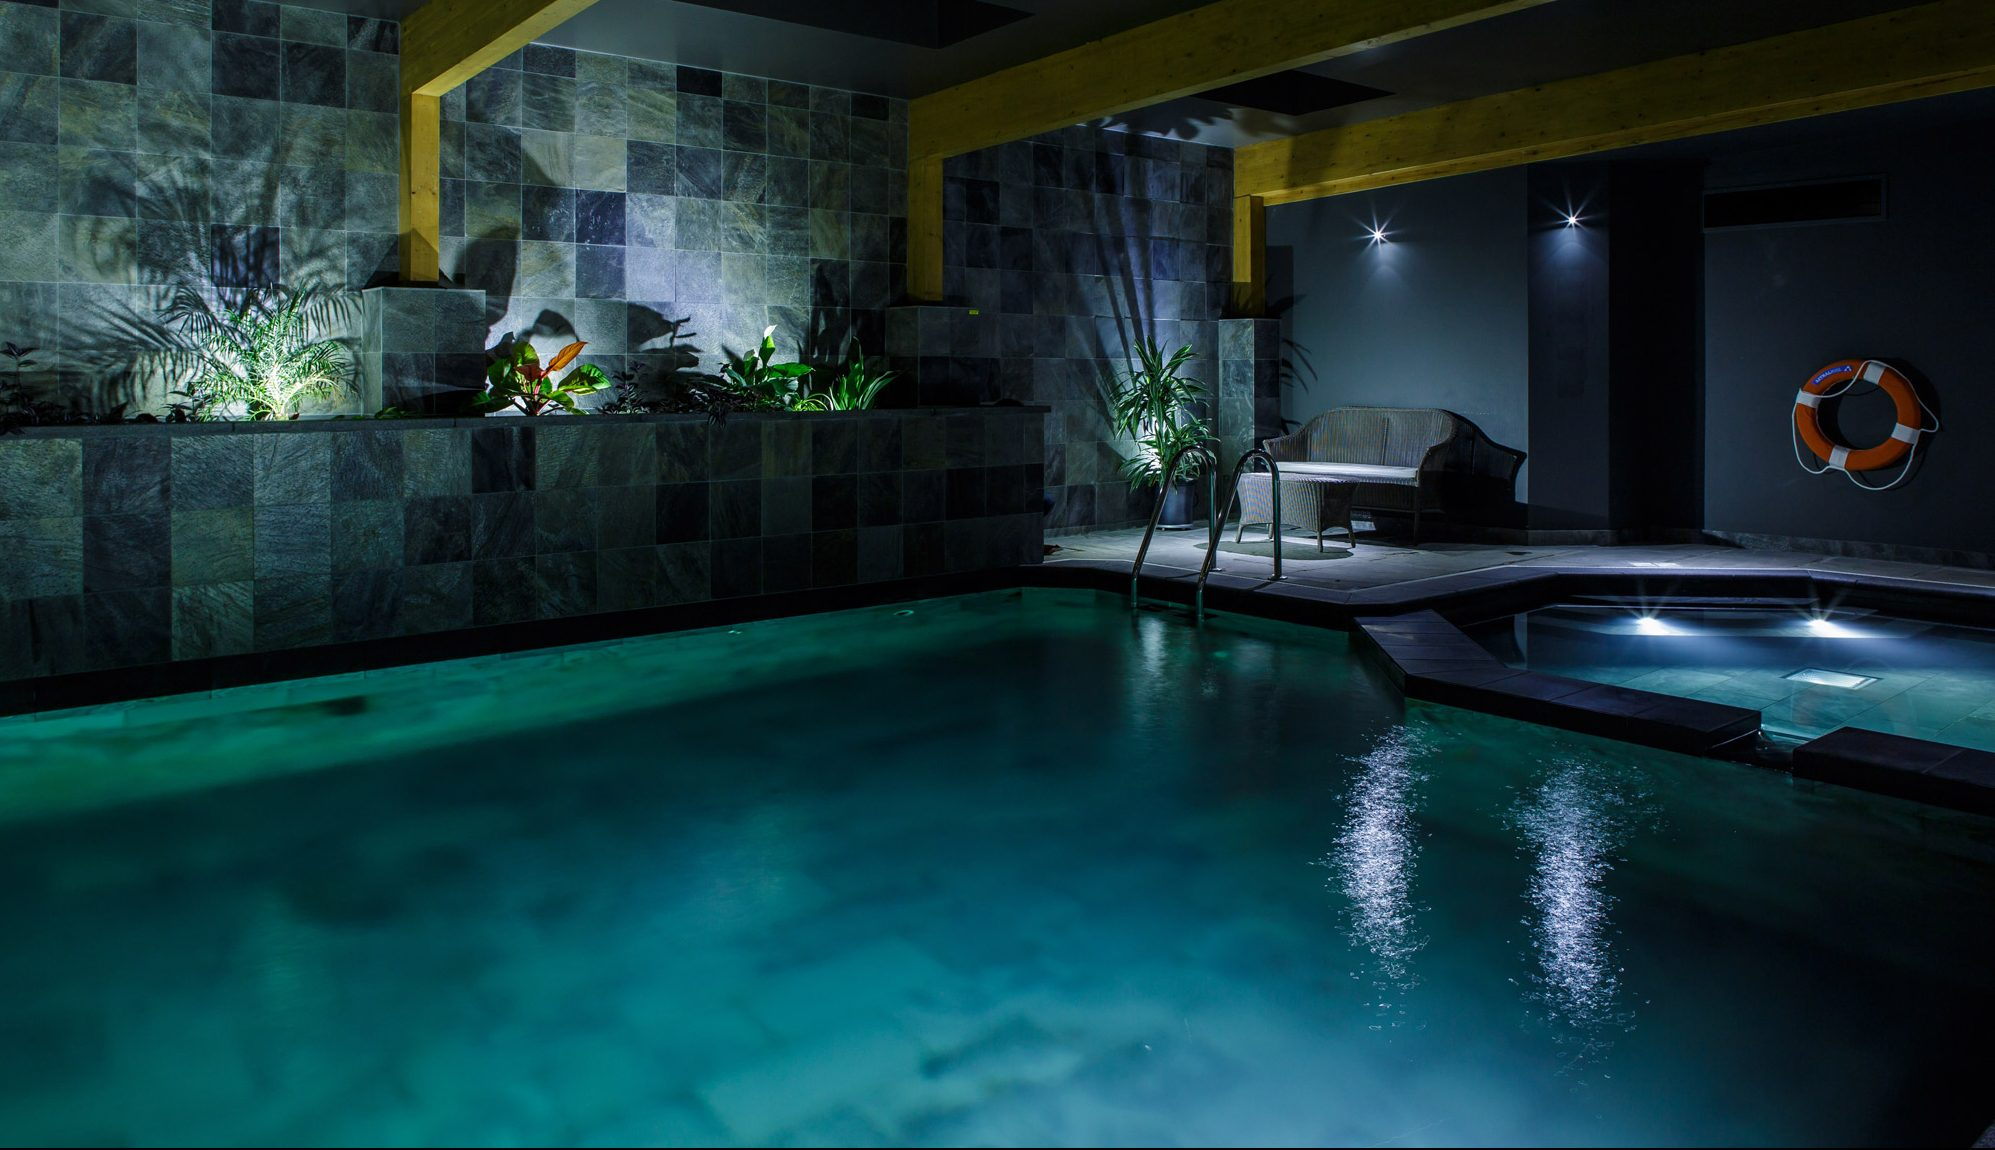 Pool gallery clear water revival for Swimmingpool aufstellbecken pool